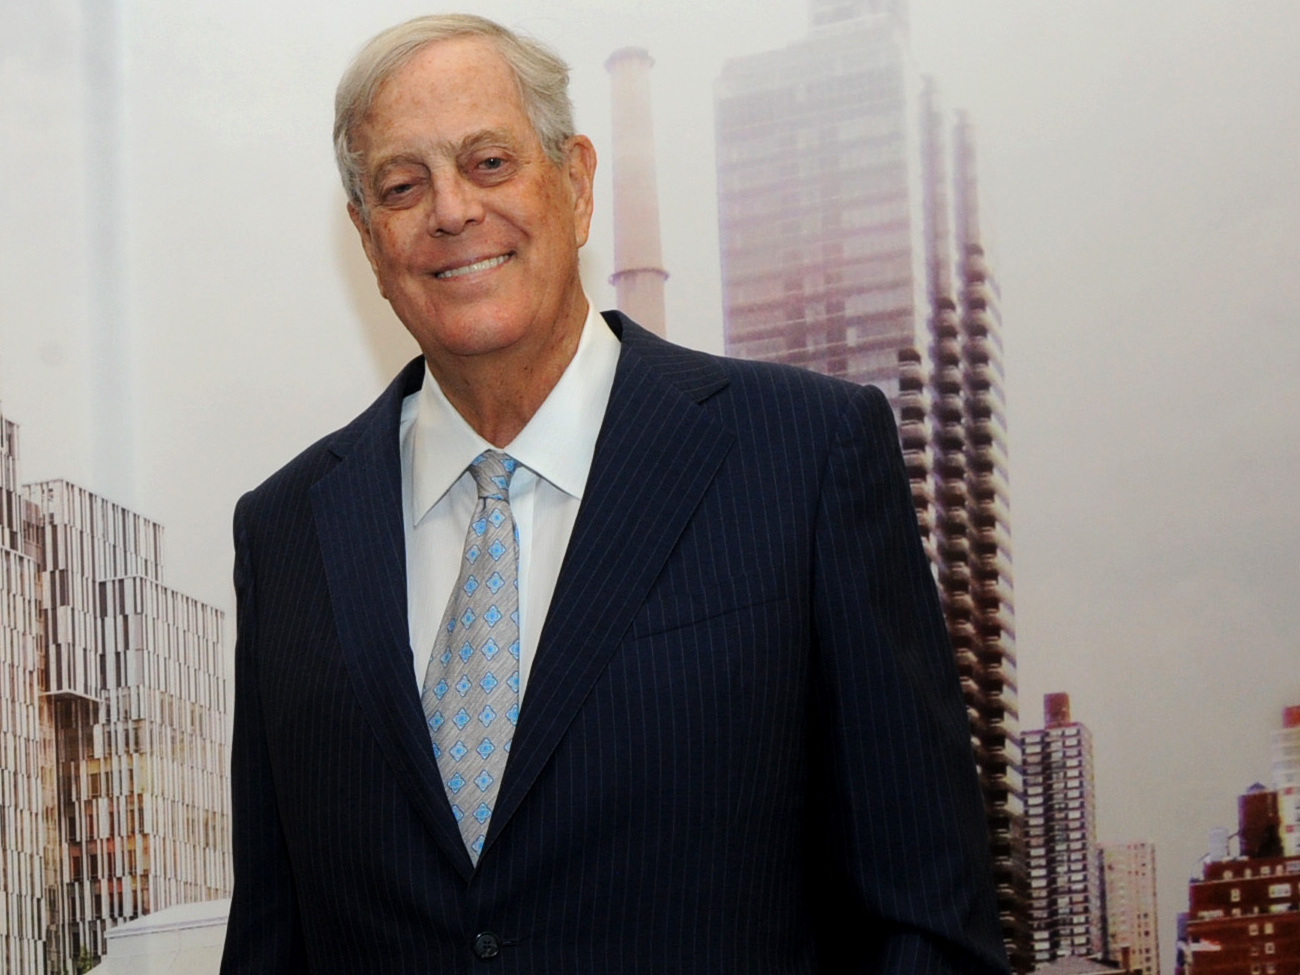 David Koch Dies; Conservative Billionaire Helped Reshape U.S. Politics